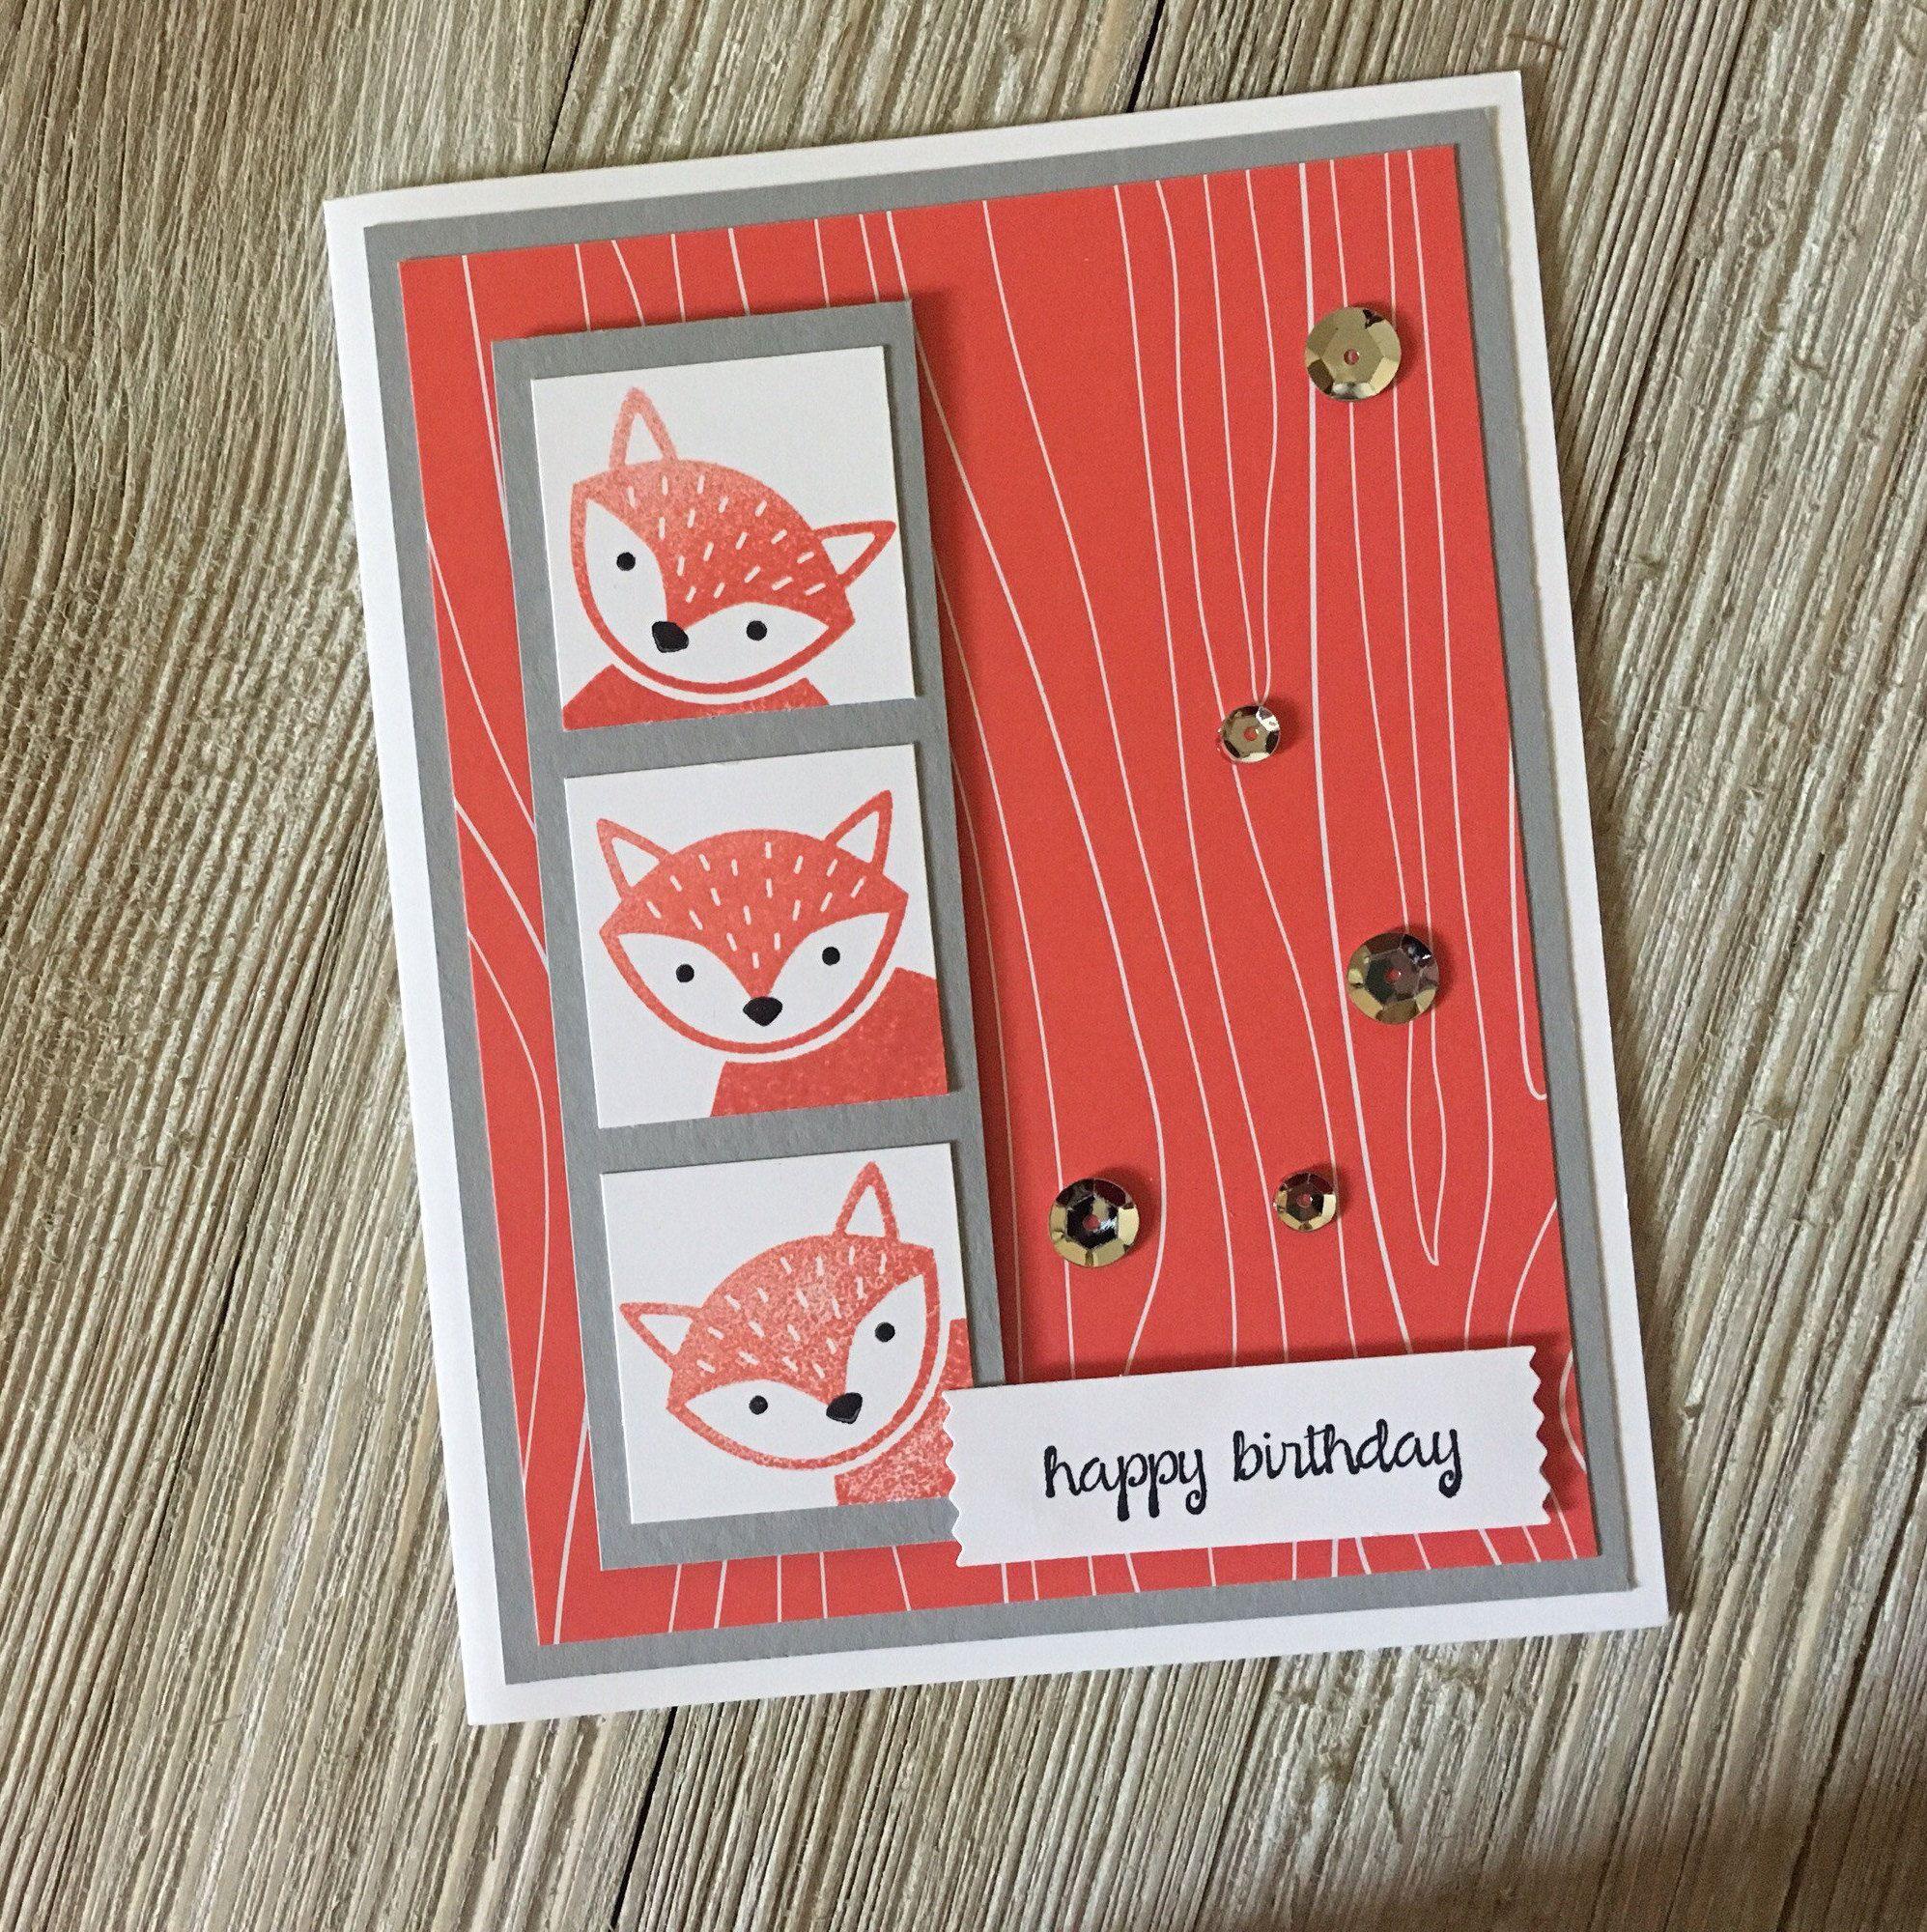 Happy Birthday Cards Birthday Cards Kids Birthday Handmade